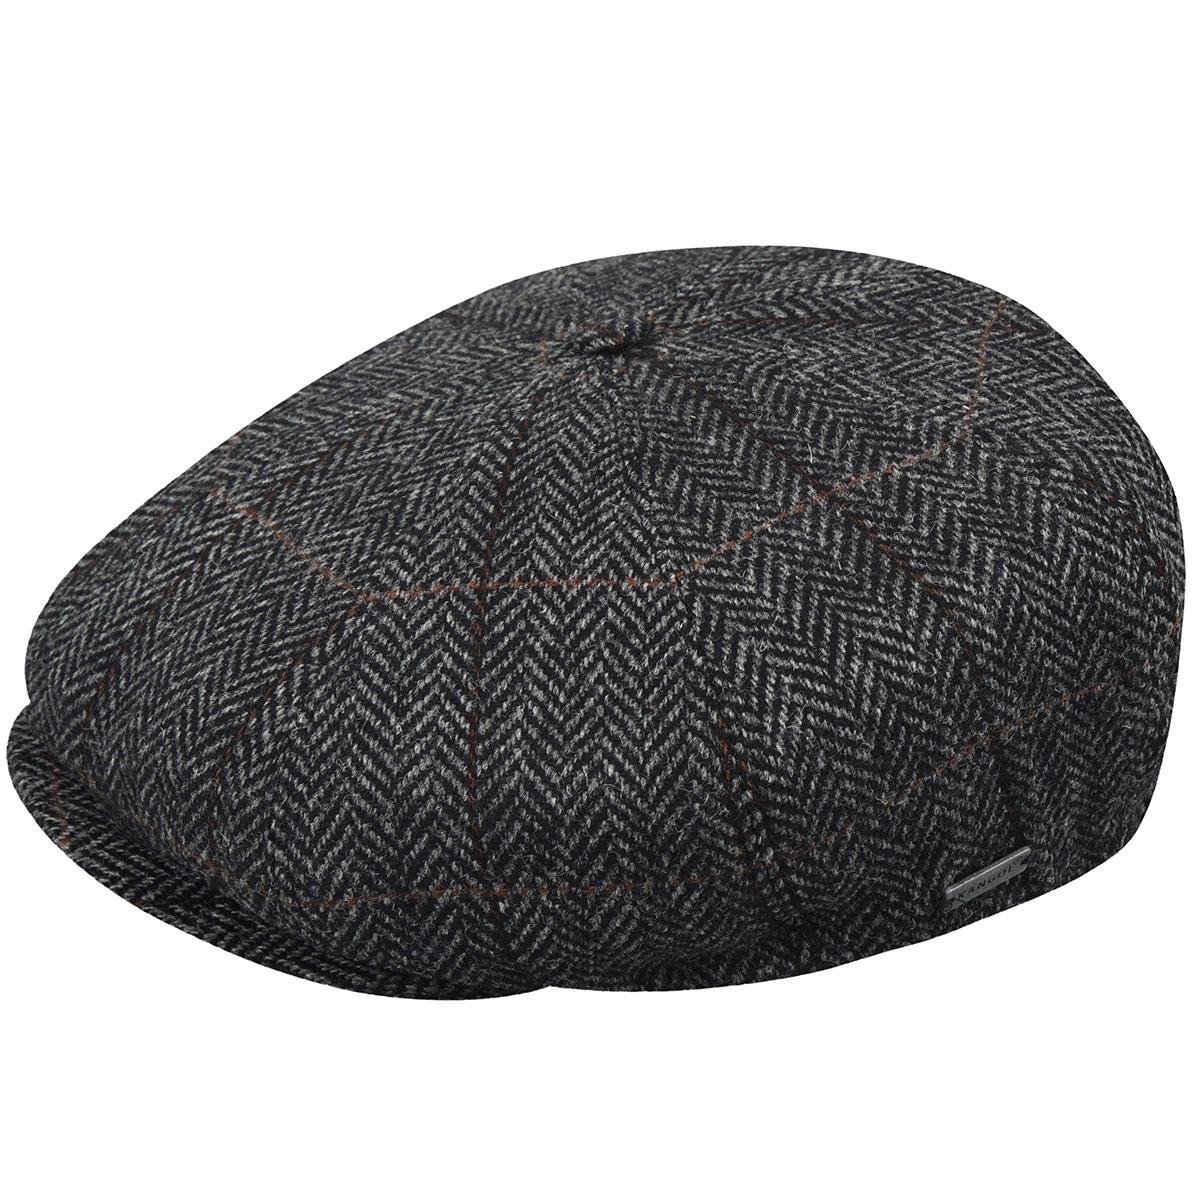 1920s Men's Hats – 8 Popular Styles Tweed Ripley Cap $82.50 AT vintagedancer.com